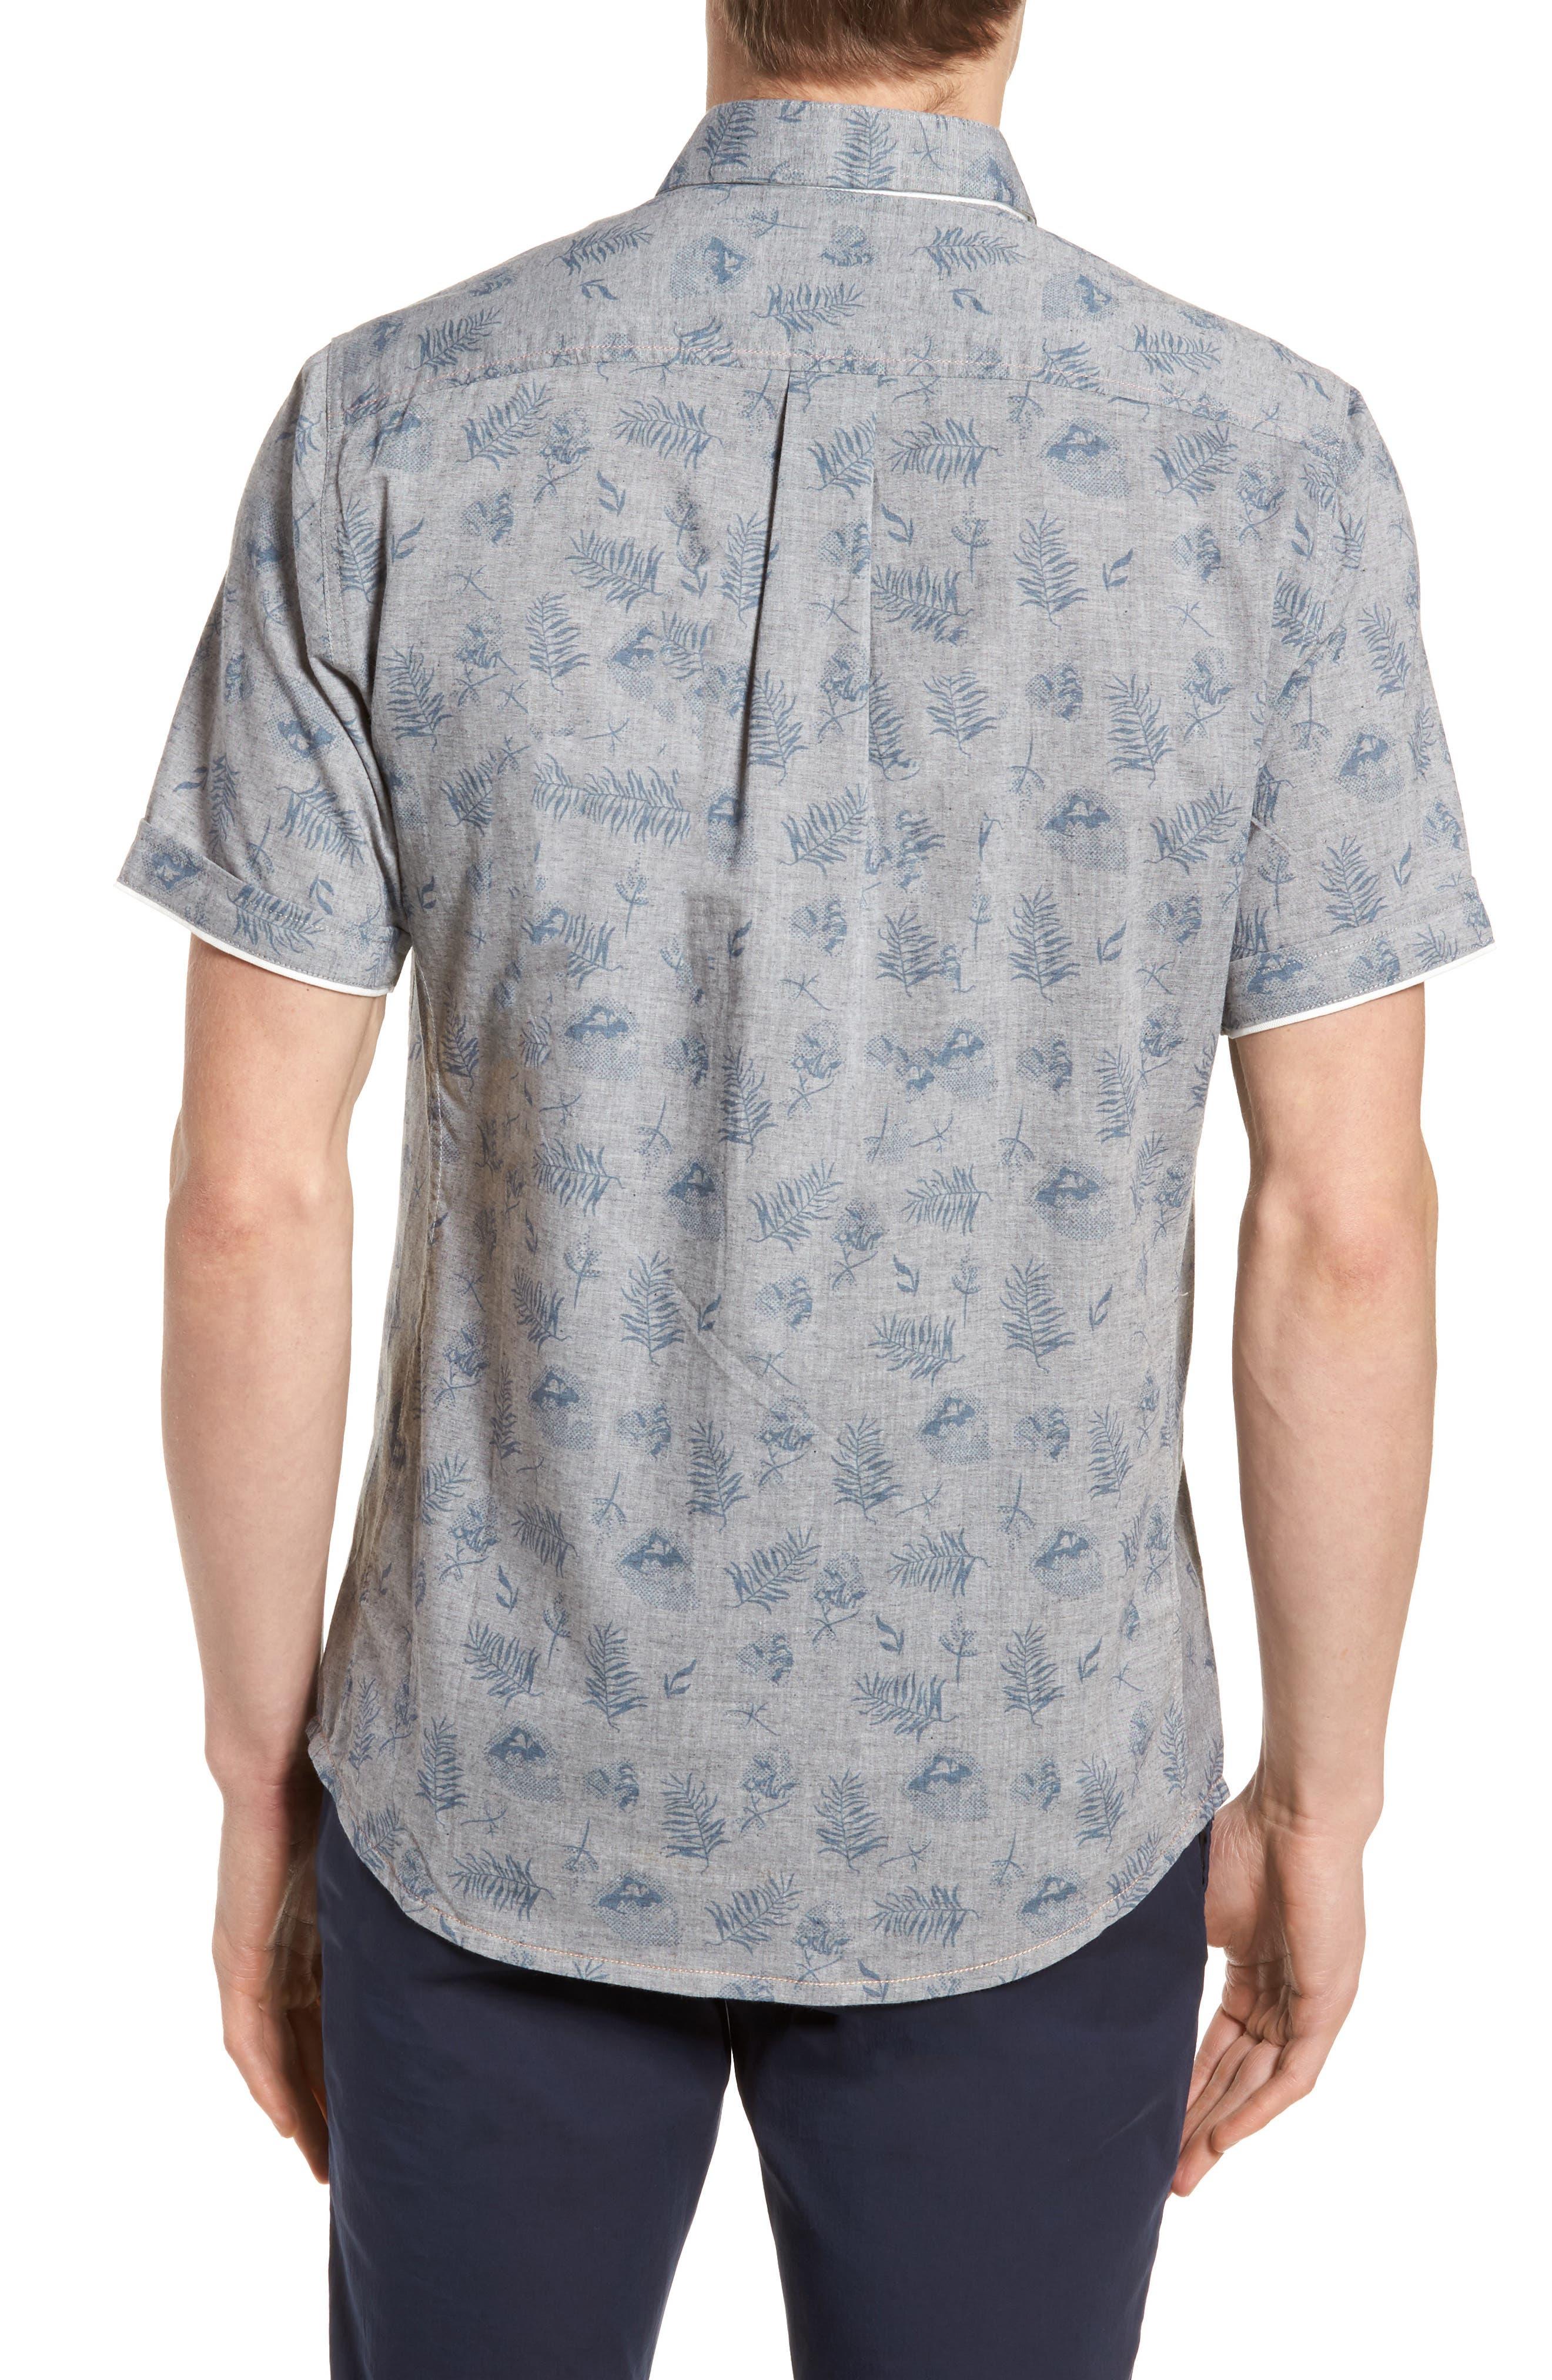 Rock Steady Woven Shirt,                             Alternate thumbnail 2, color,                             GREY